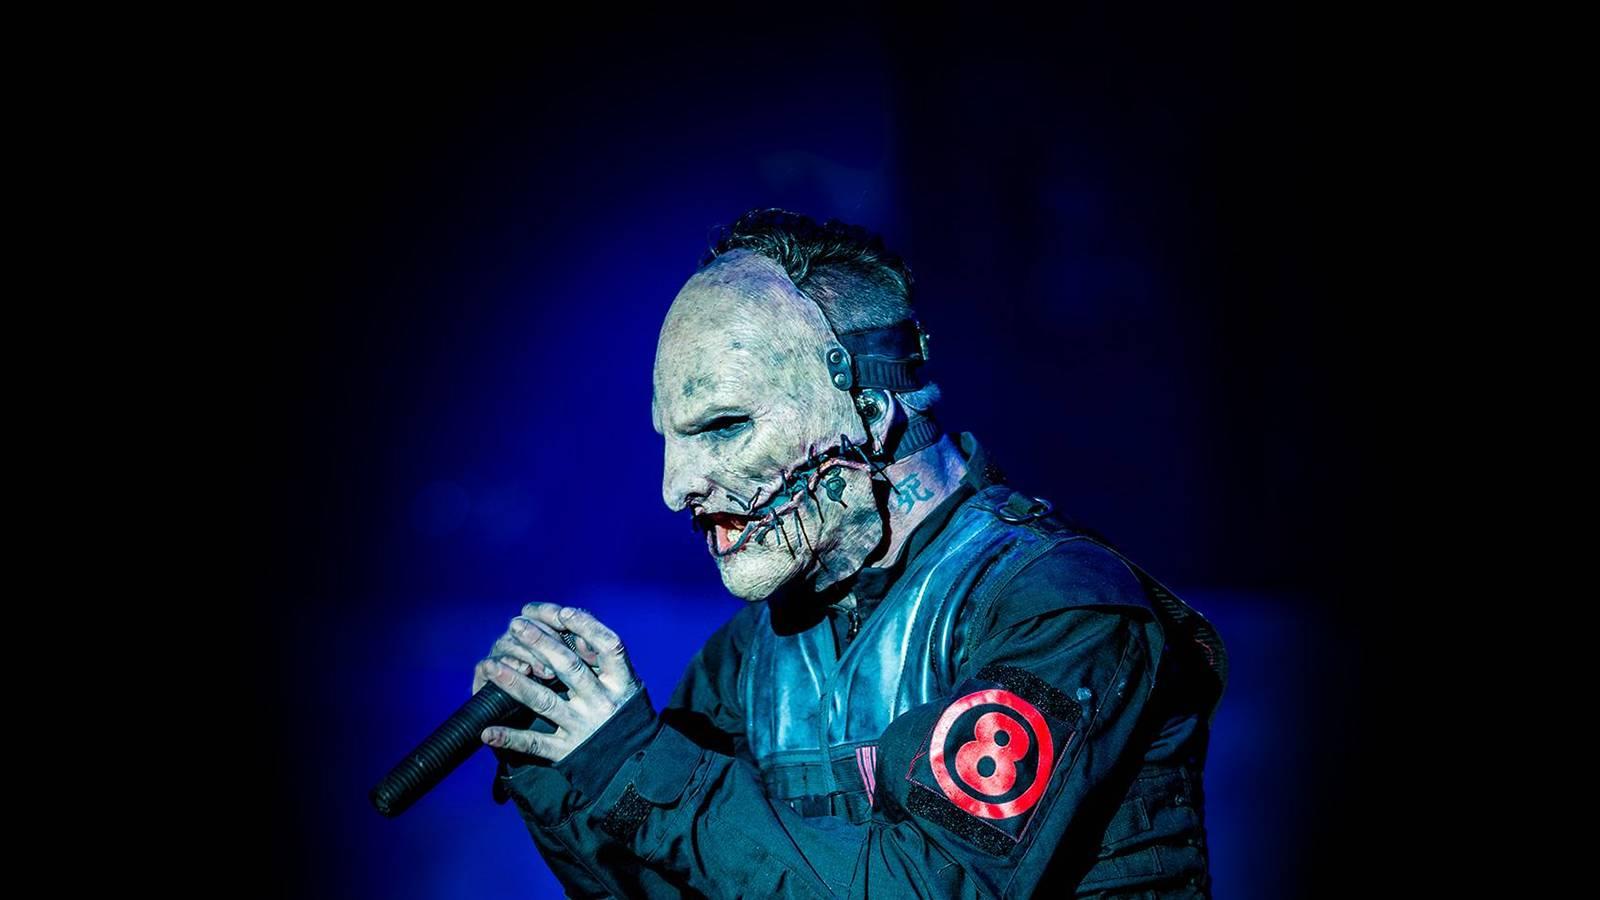 Knotfest - Slipknot, A Day To Remember, Underoath, Code Orange